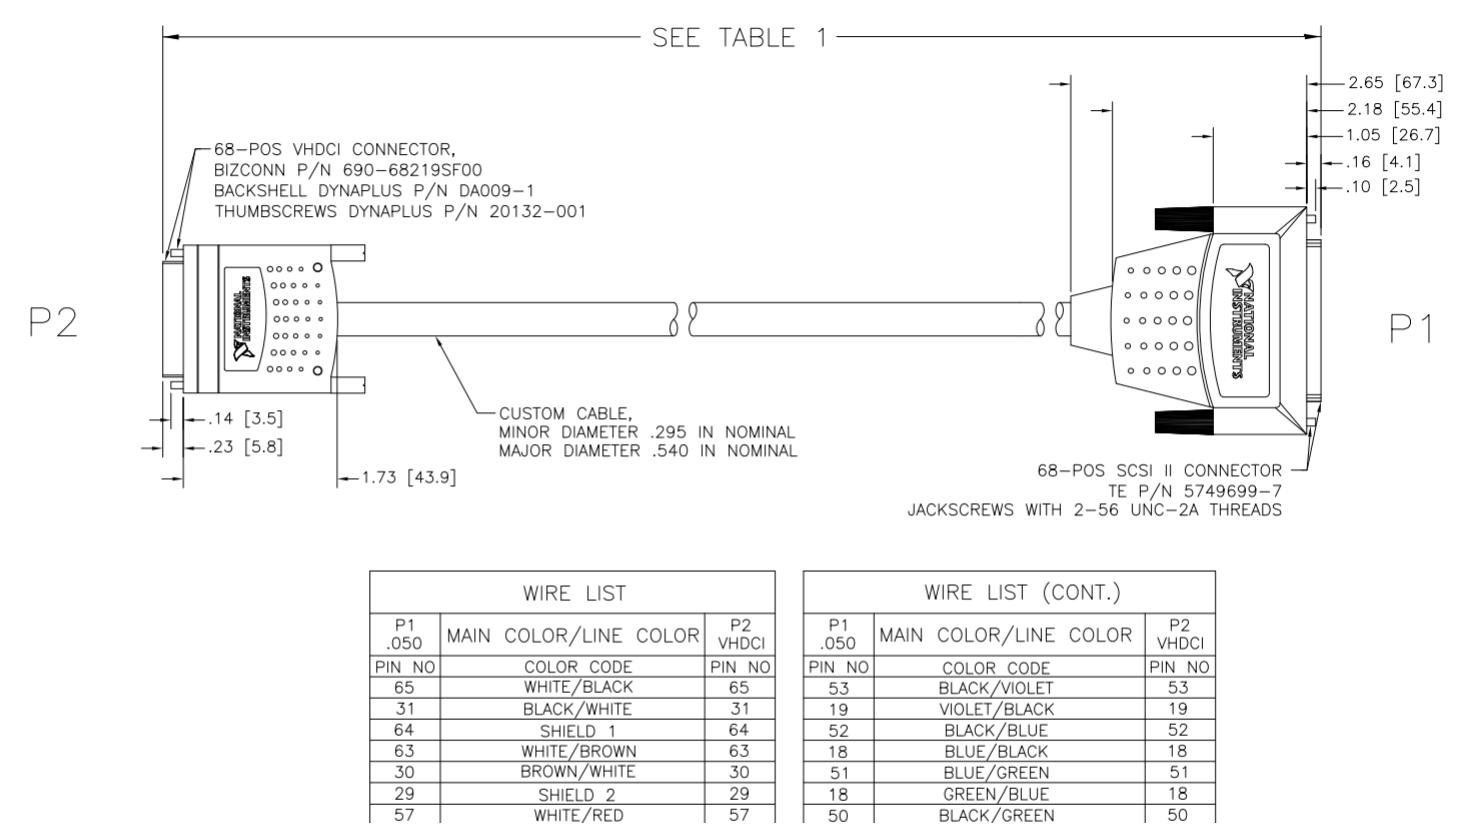 Fein Accel Dfi Schaltplan Ideen - Schaltplan Serie Circuit ...